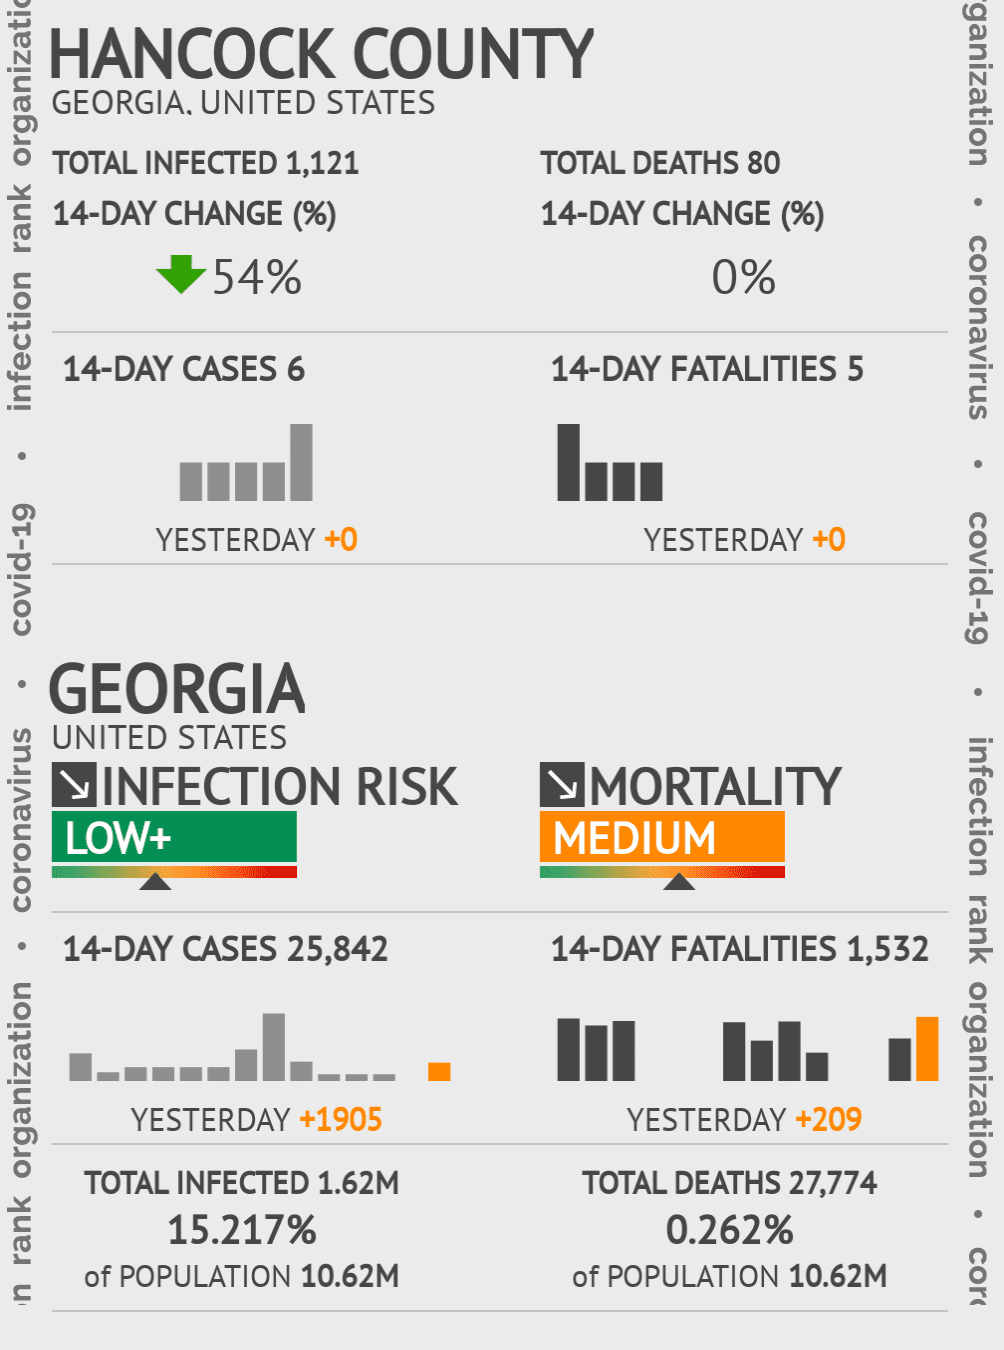 Hancock County Coronavirus Covid-19 Risk of Infection on March 04, 2021